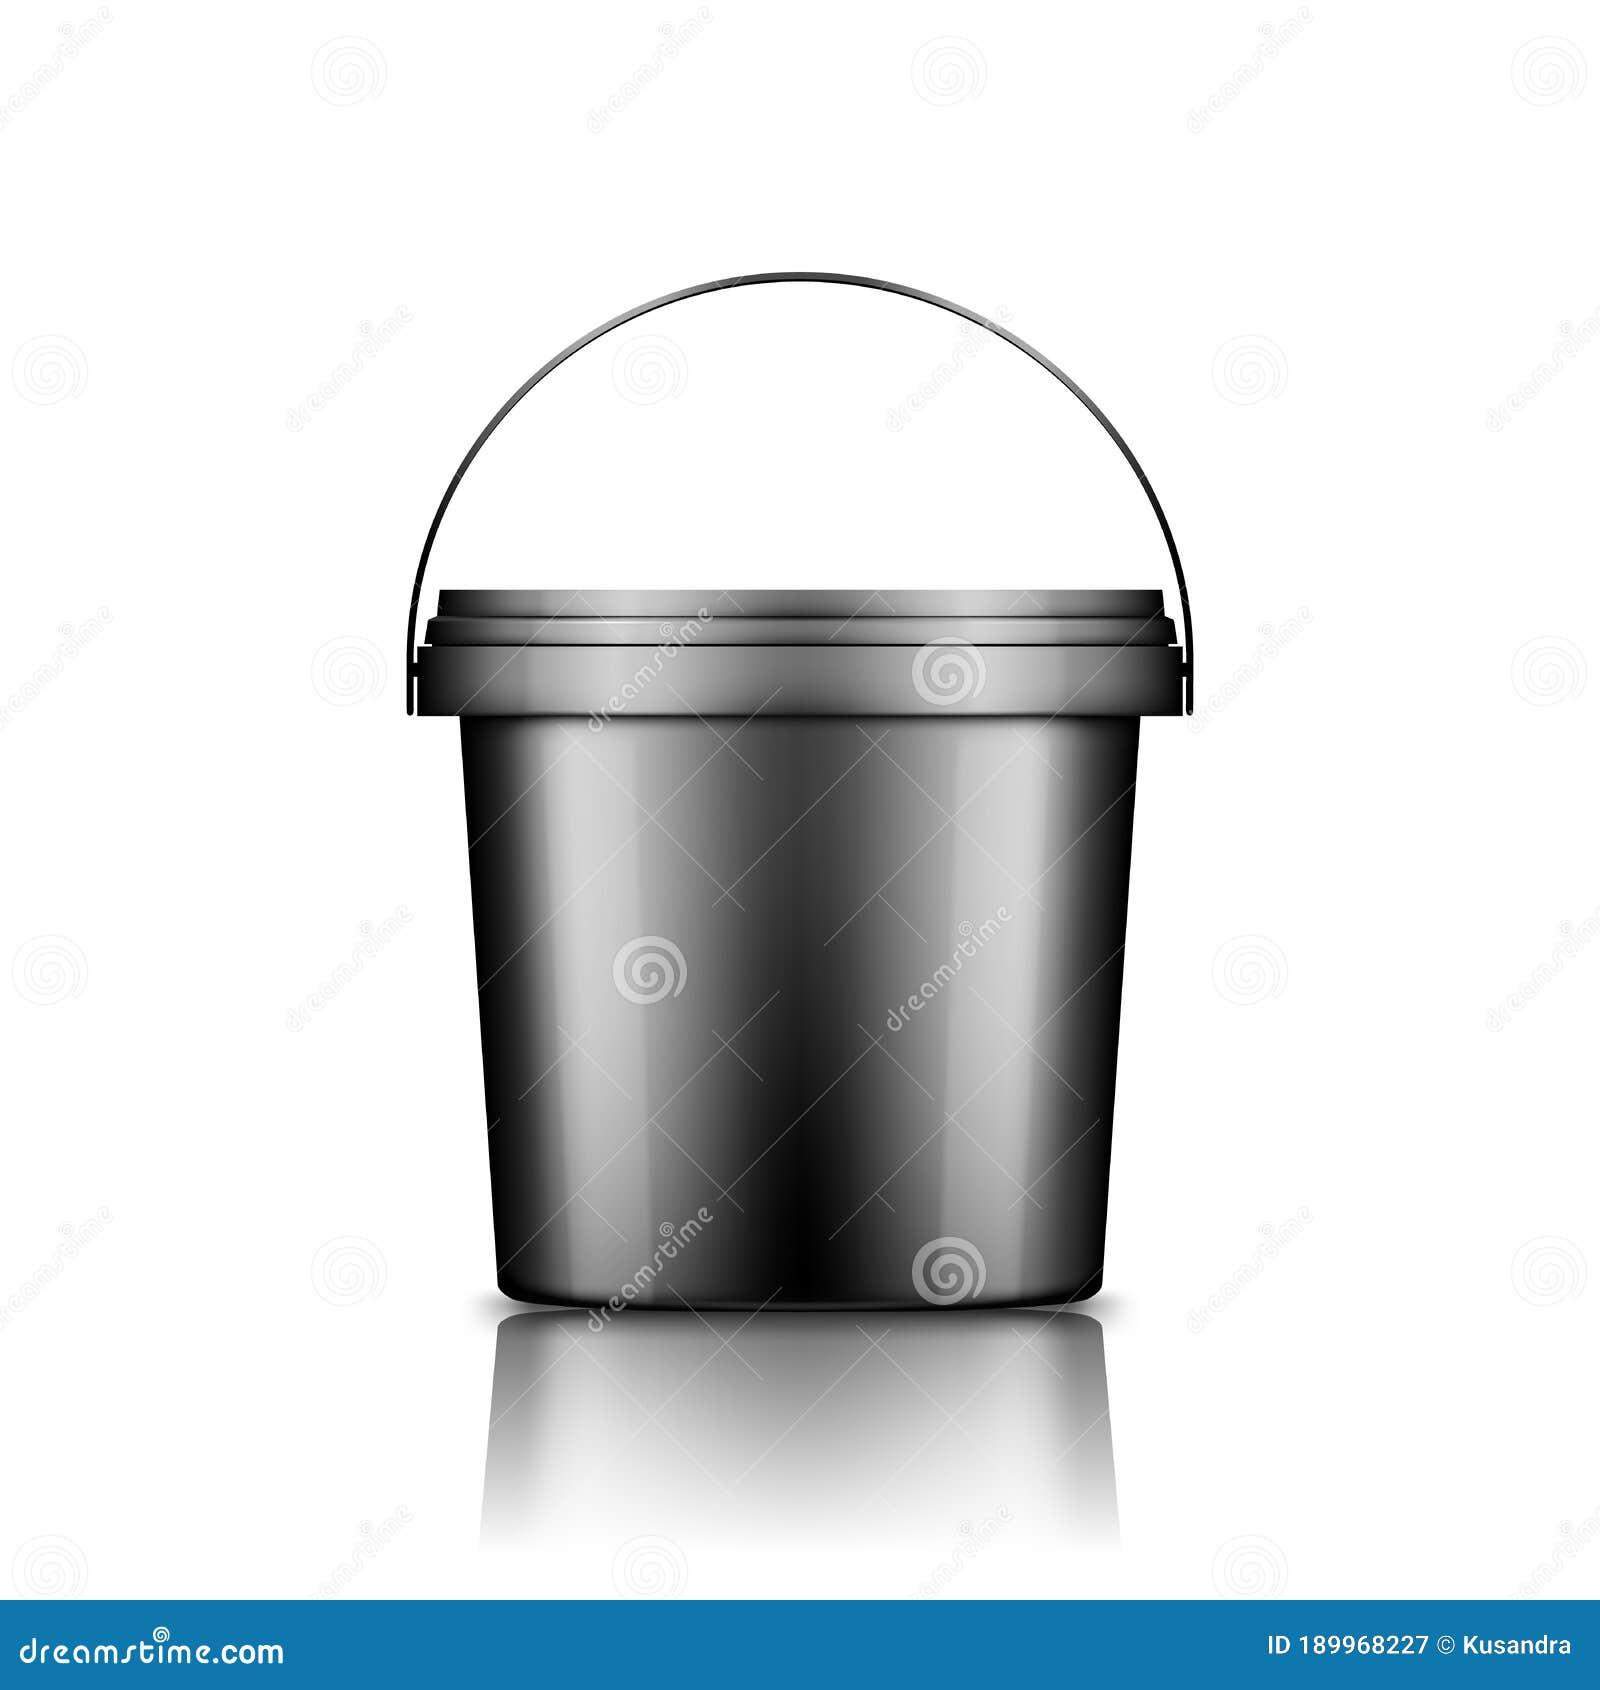 Black Ice Cream Yoghurt Mayo Or Paint Bucket With Handle Mockup Isolated On White Background Stock Vector Illustration Of Black Construction 189968227